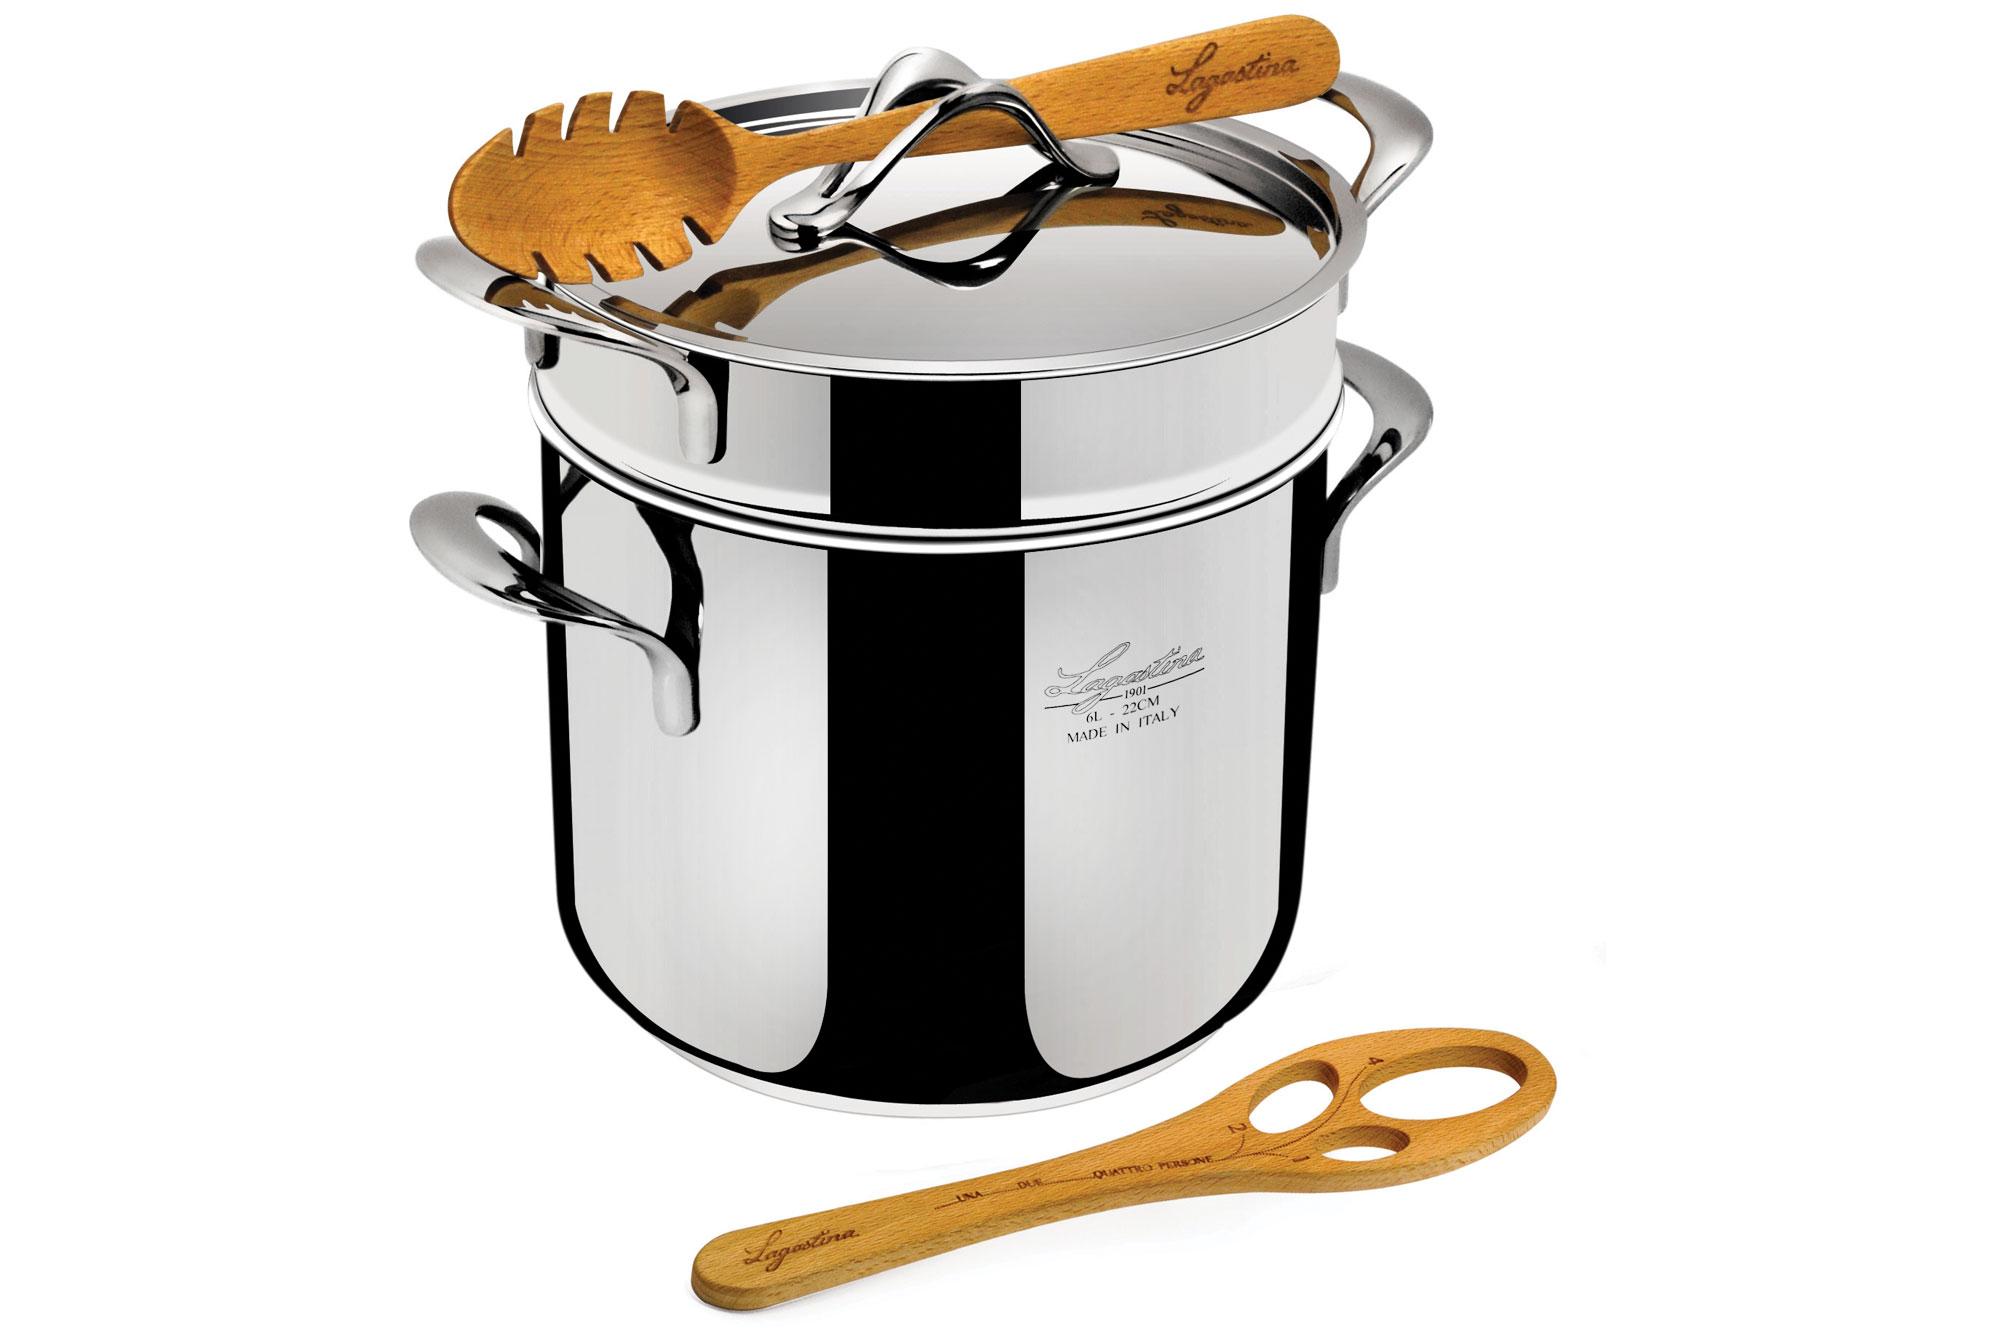 Lagostina Pastaiola Pot 6 Quart Cutlery And More